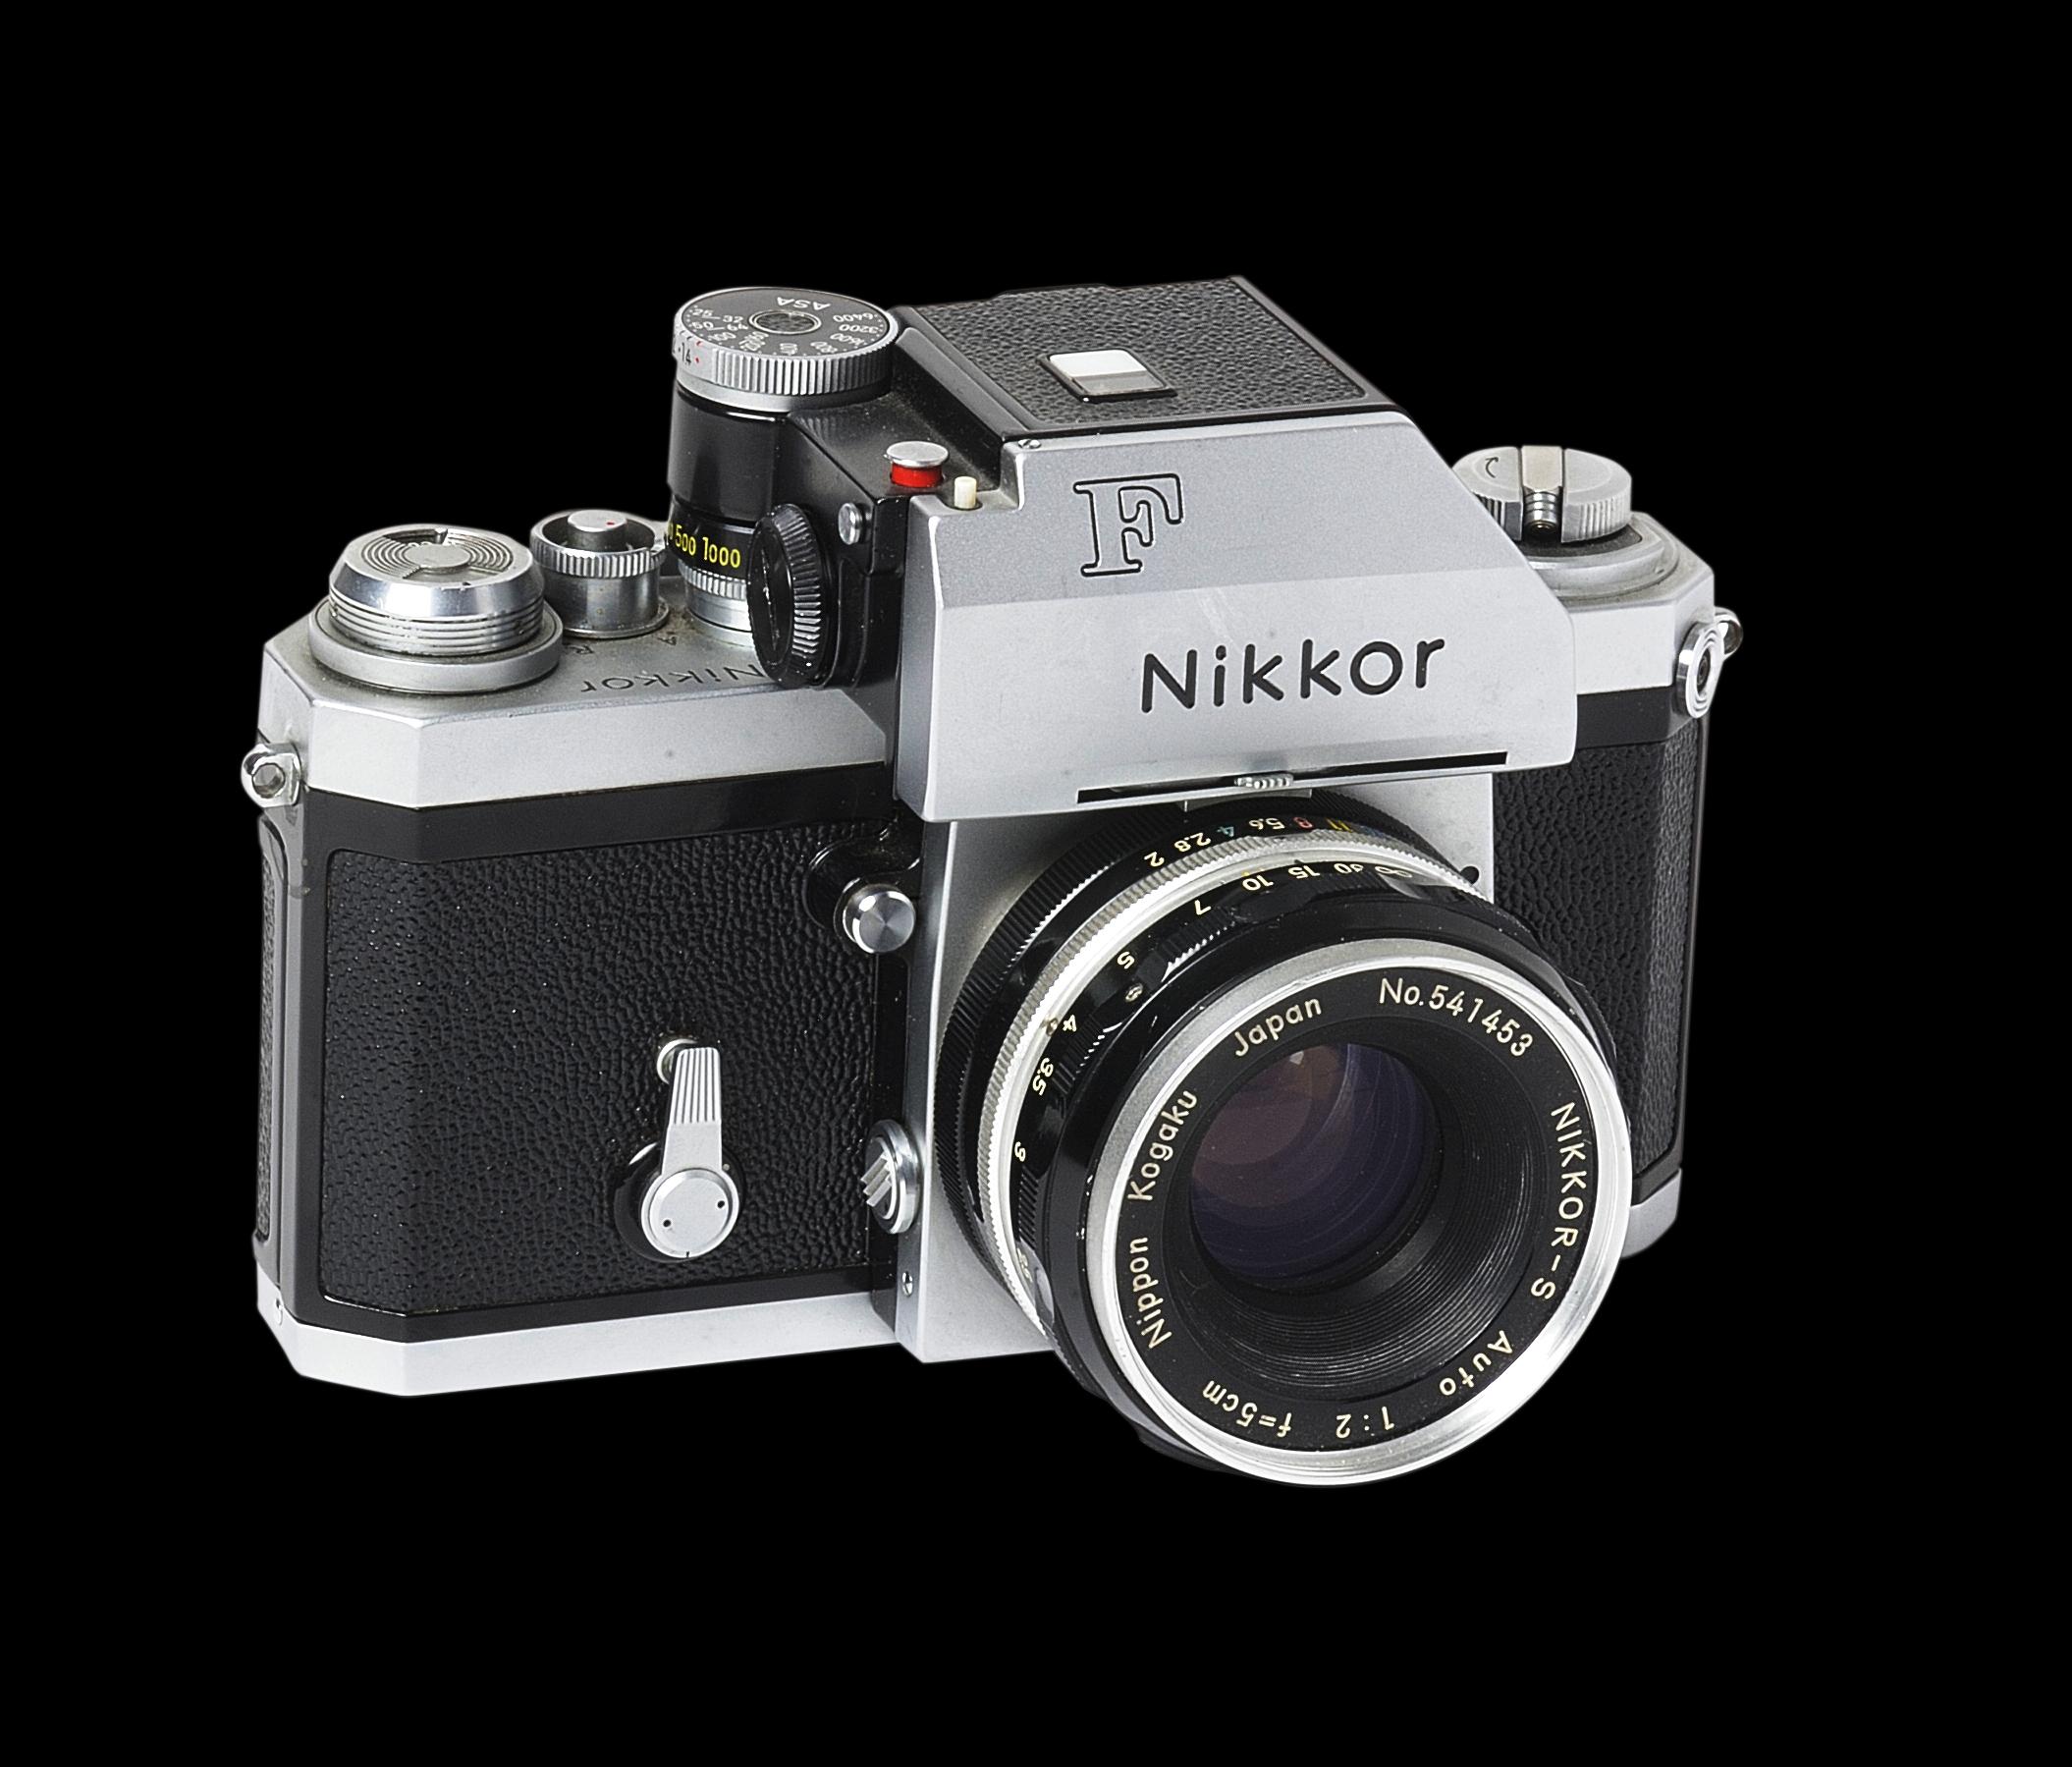 rencontres Nikon F3 idées de rencontres en plein air